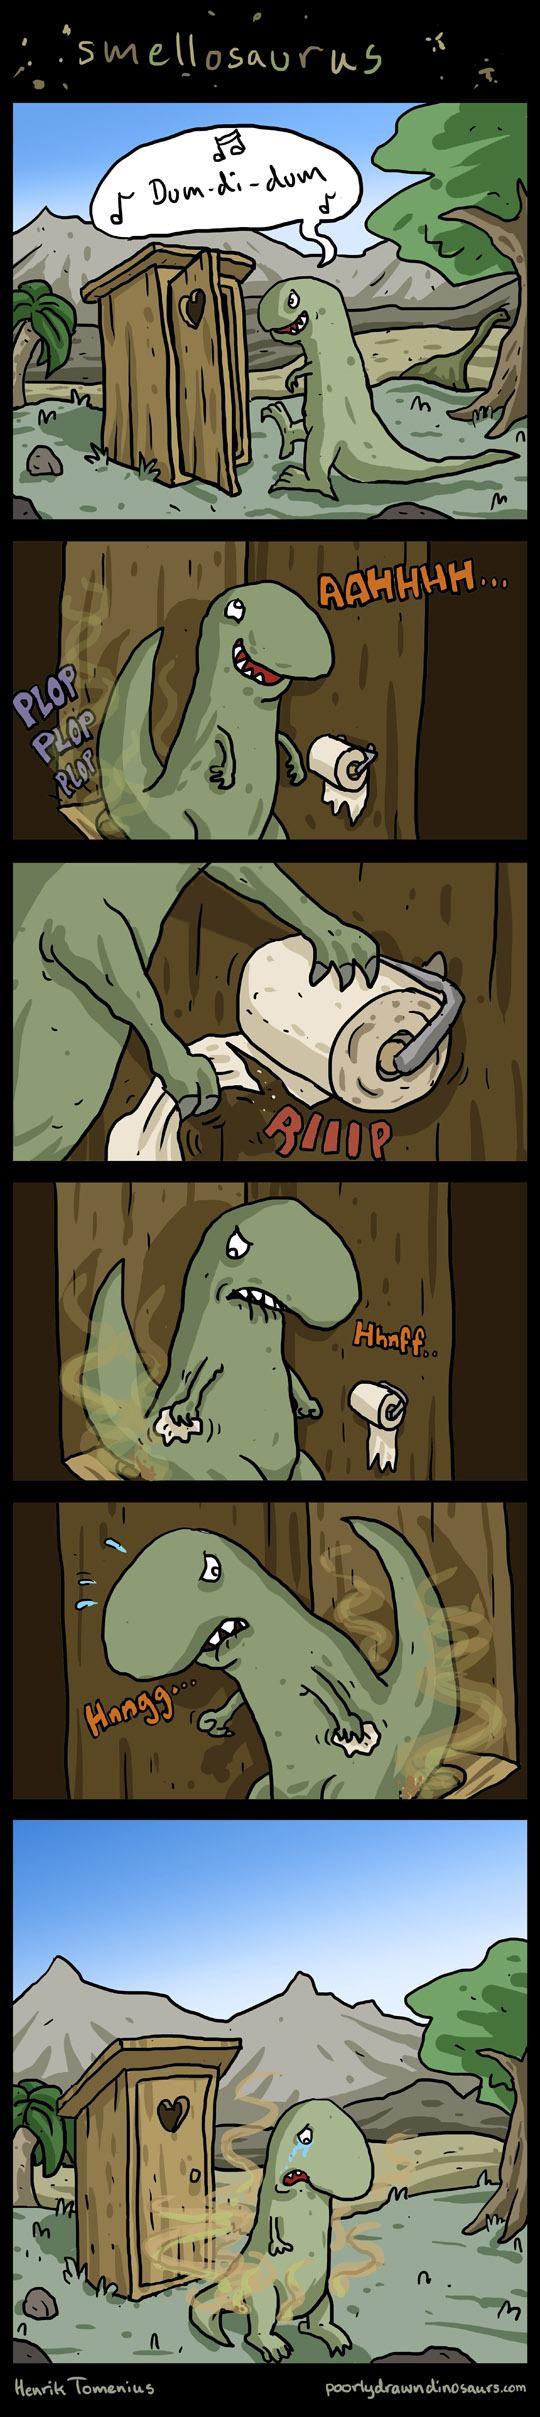 10Smellosaurus